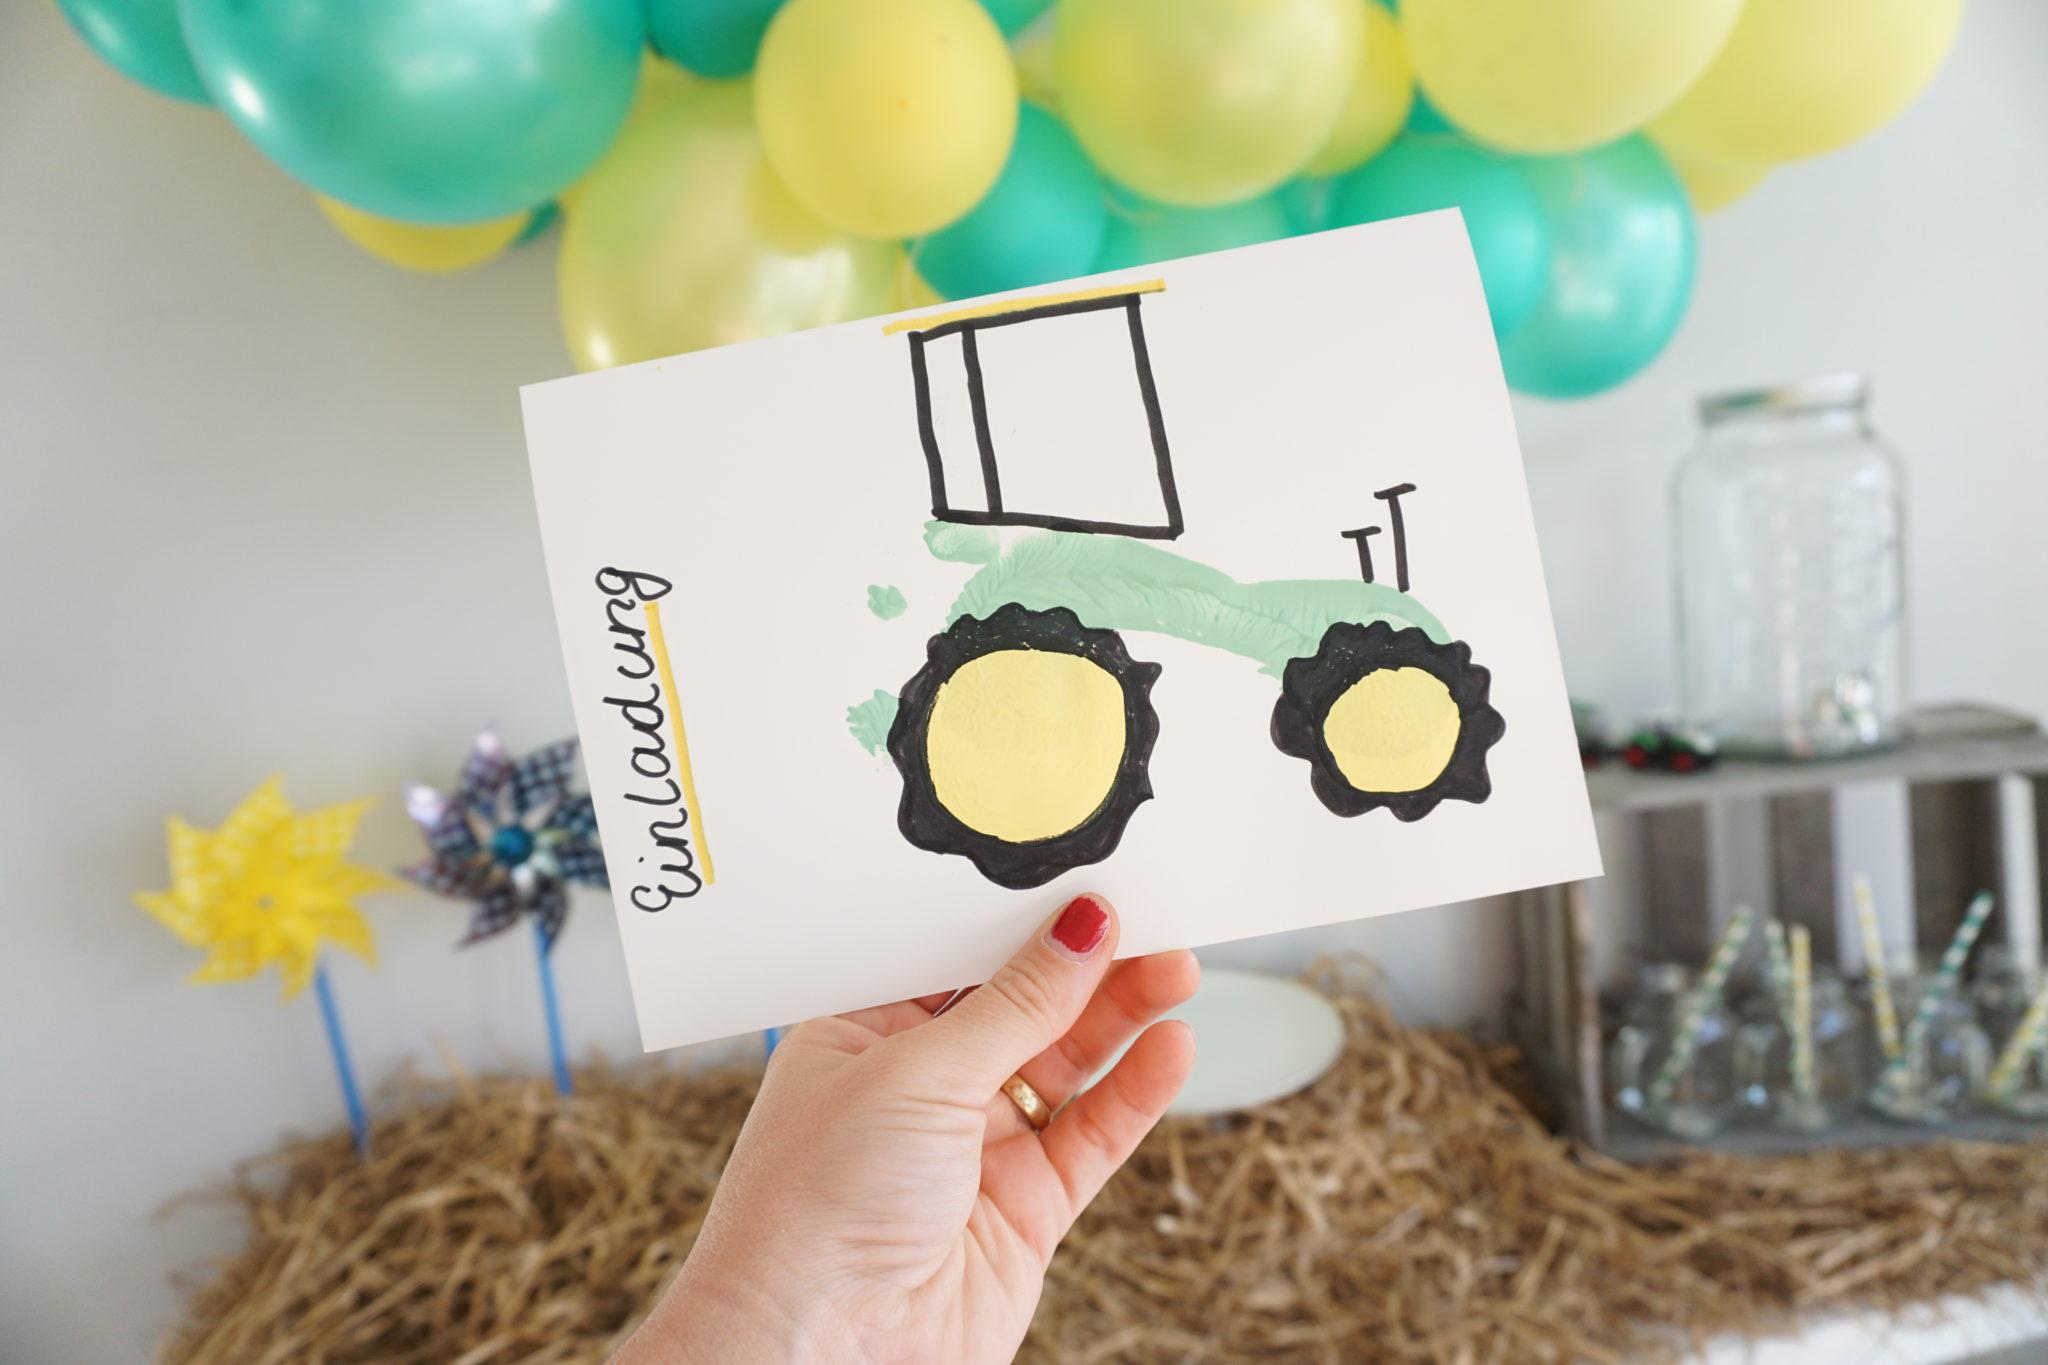 Traktor Geburtstag Einladung Torte Deko Deko Hus